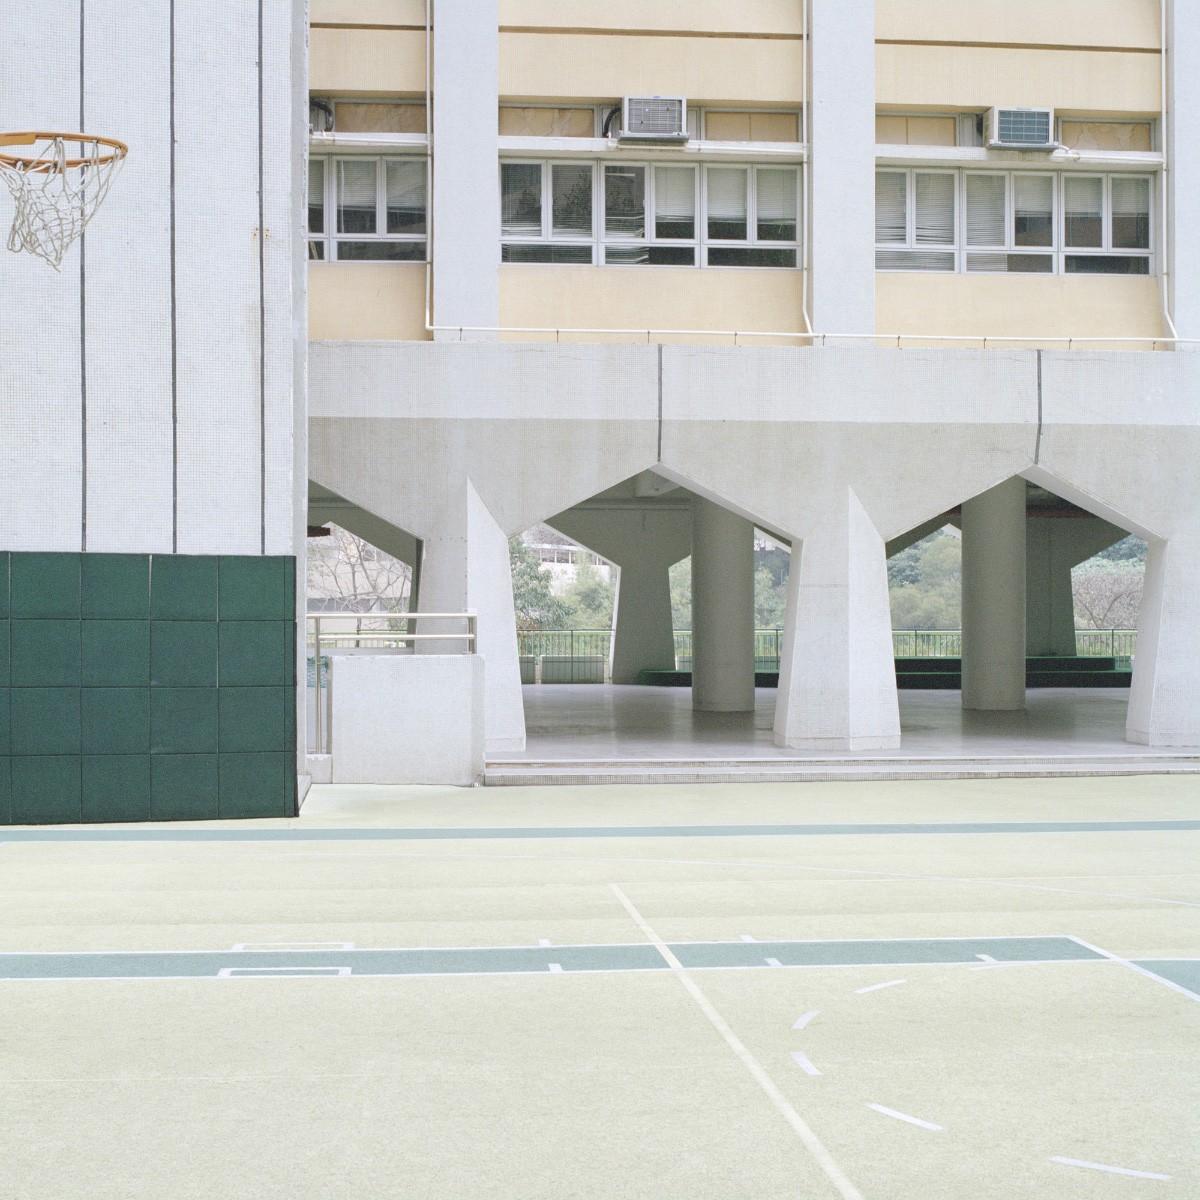 ward-roberts-courts-02.2-2838a91113dbff30a2d8fc43290c84cf